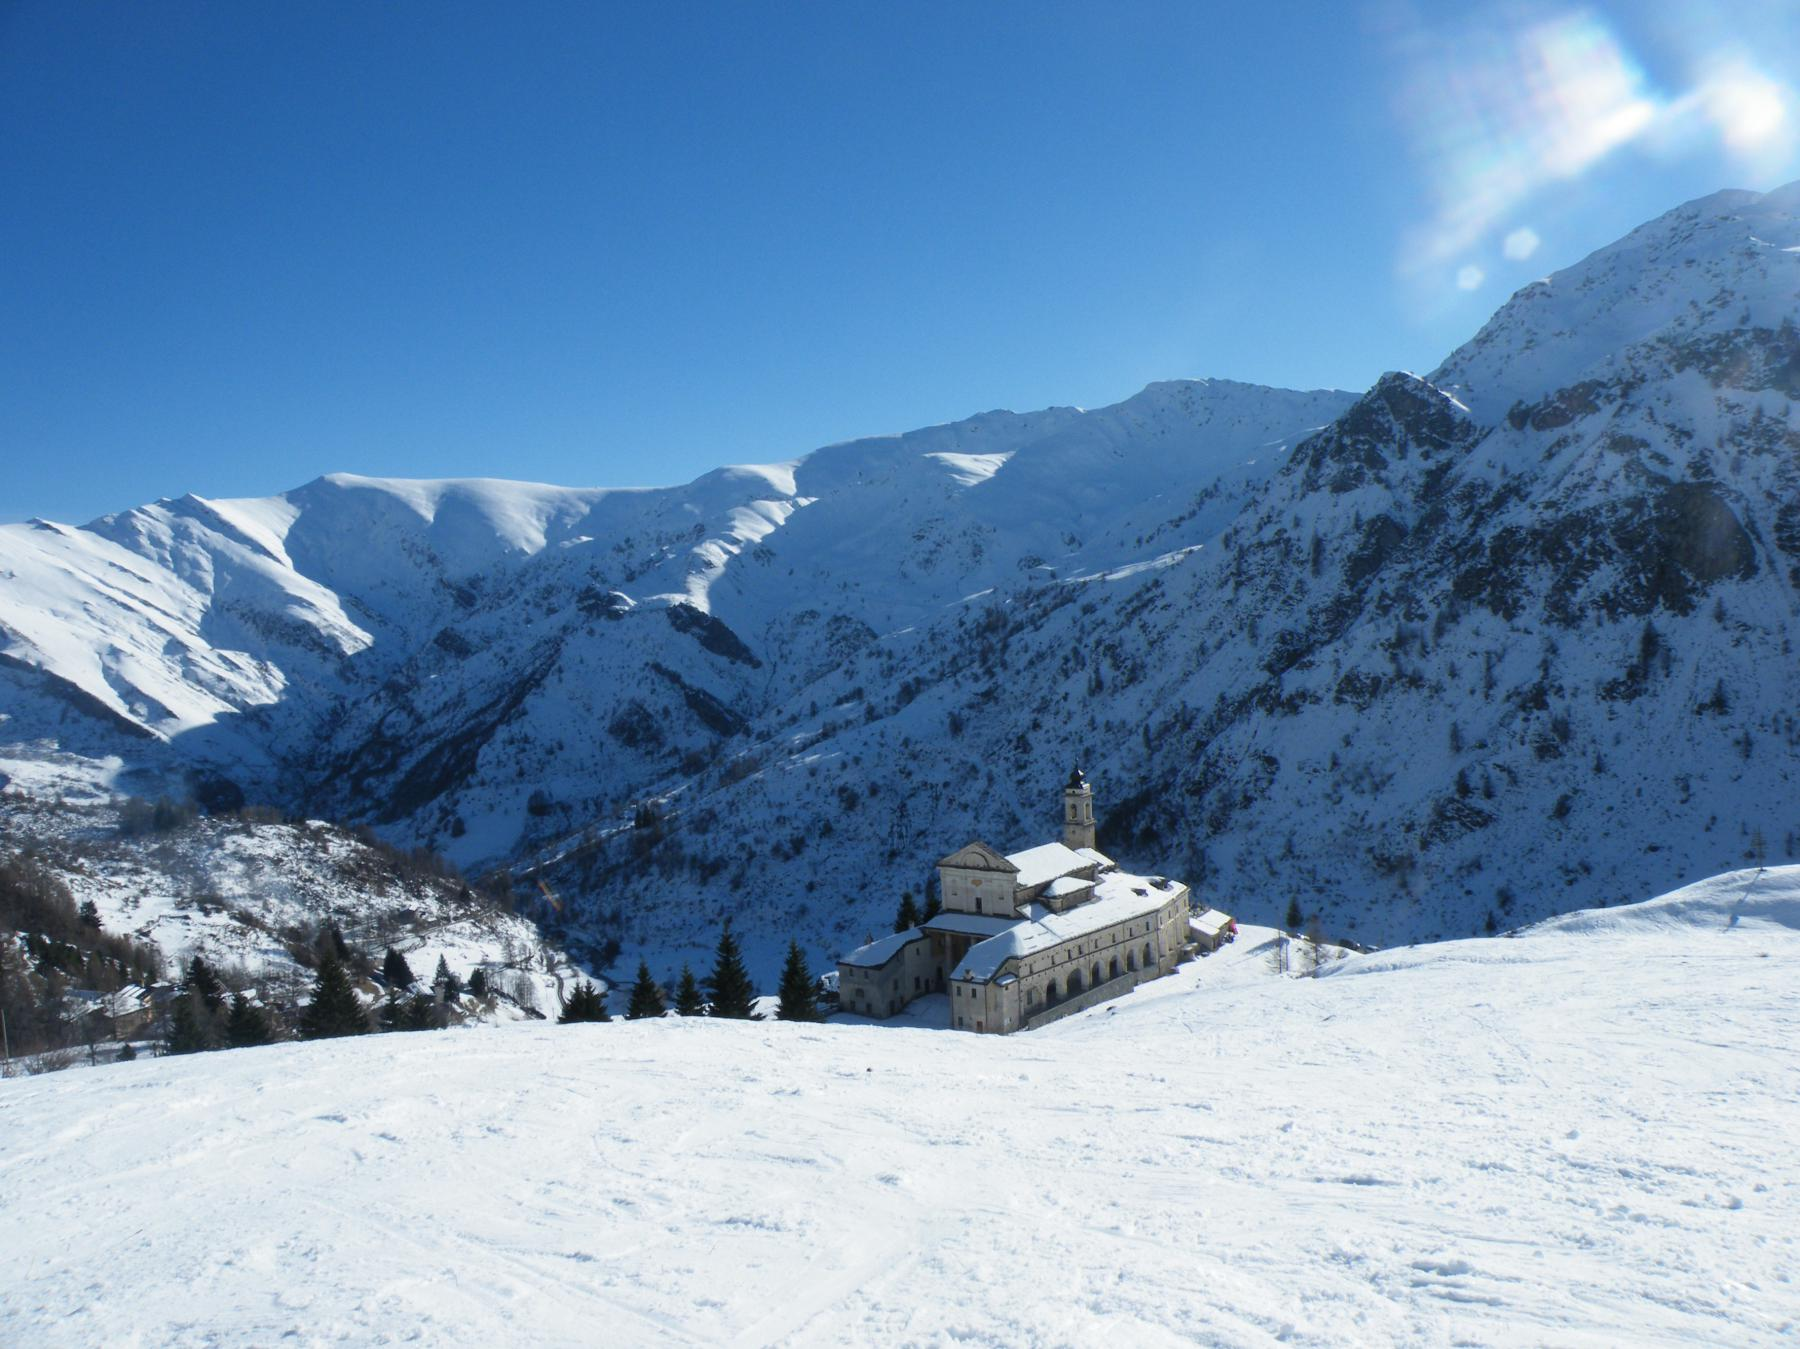 Poca neve al Santuario di S. Magno